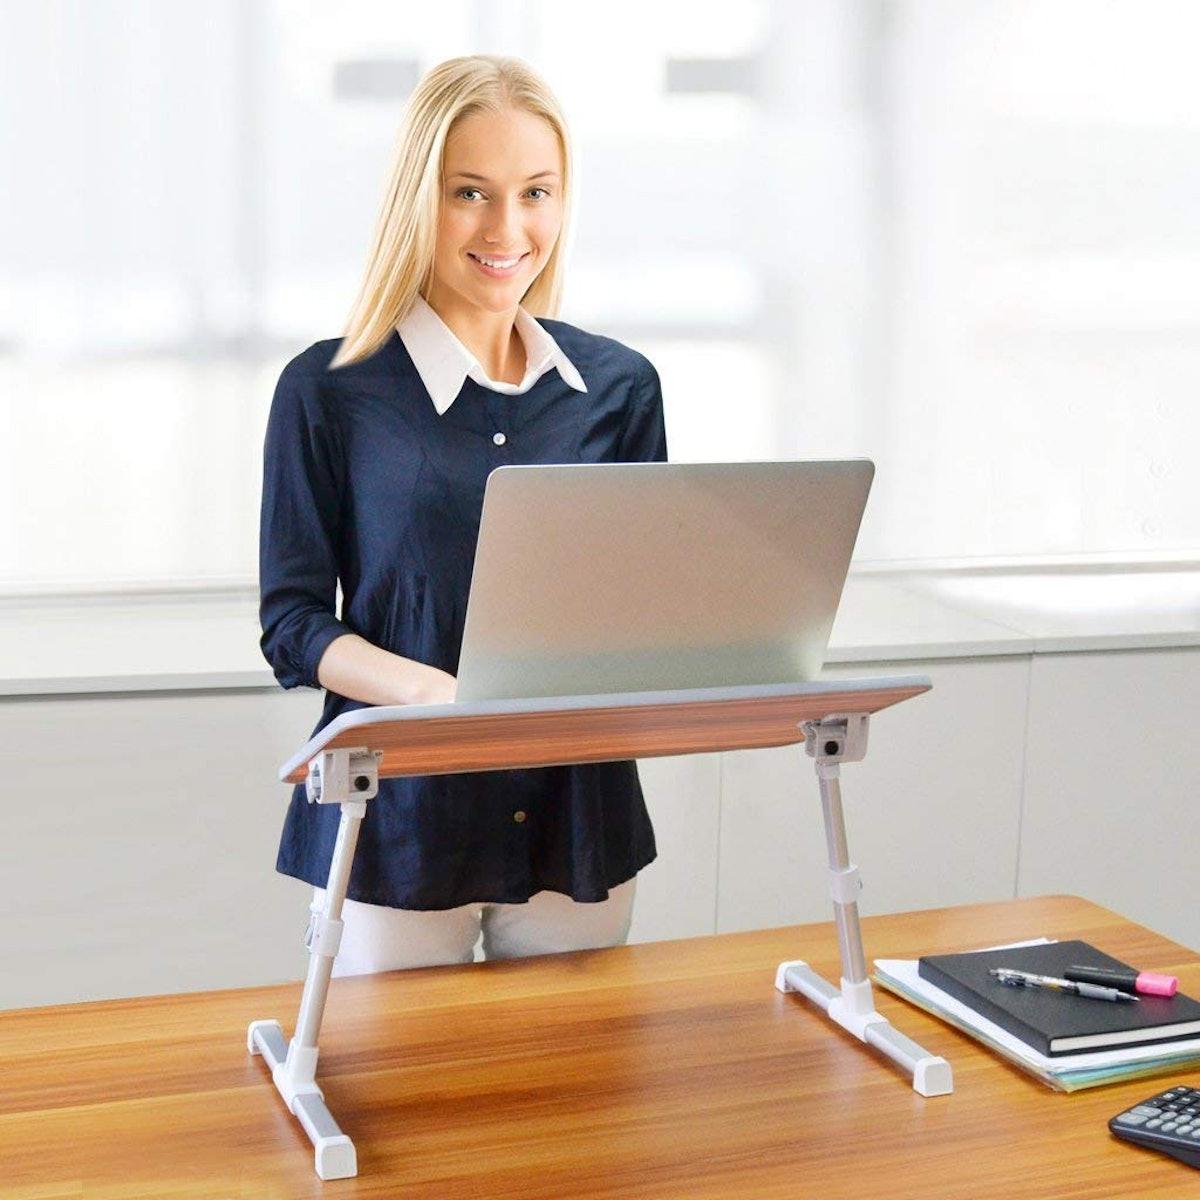 Neeto Adjustable Laptop Stand